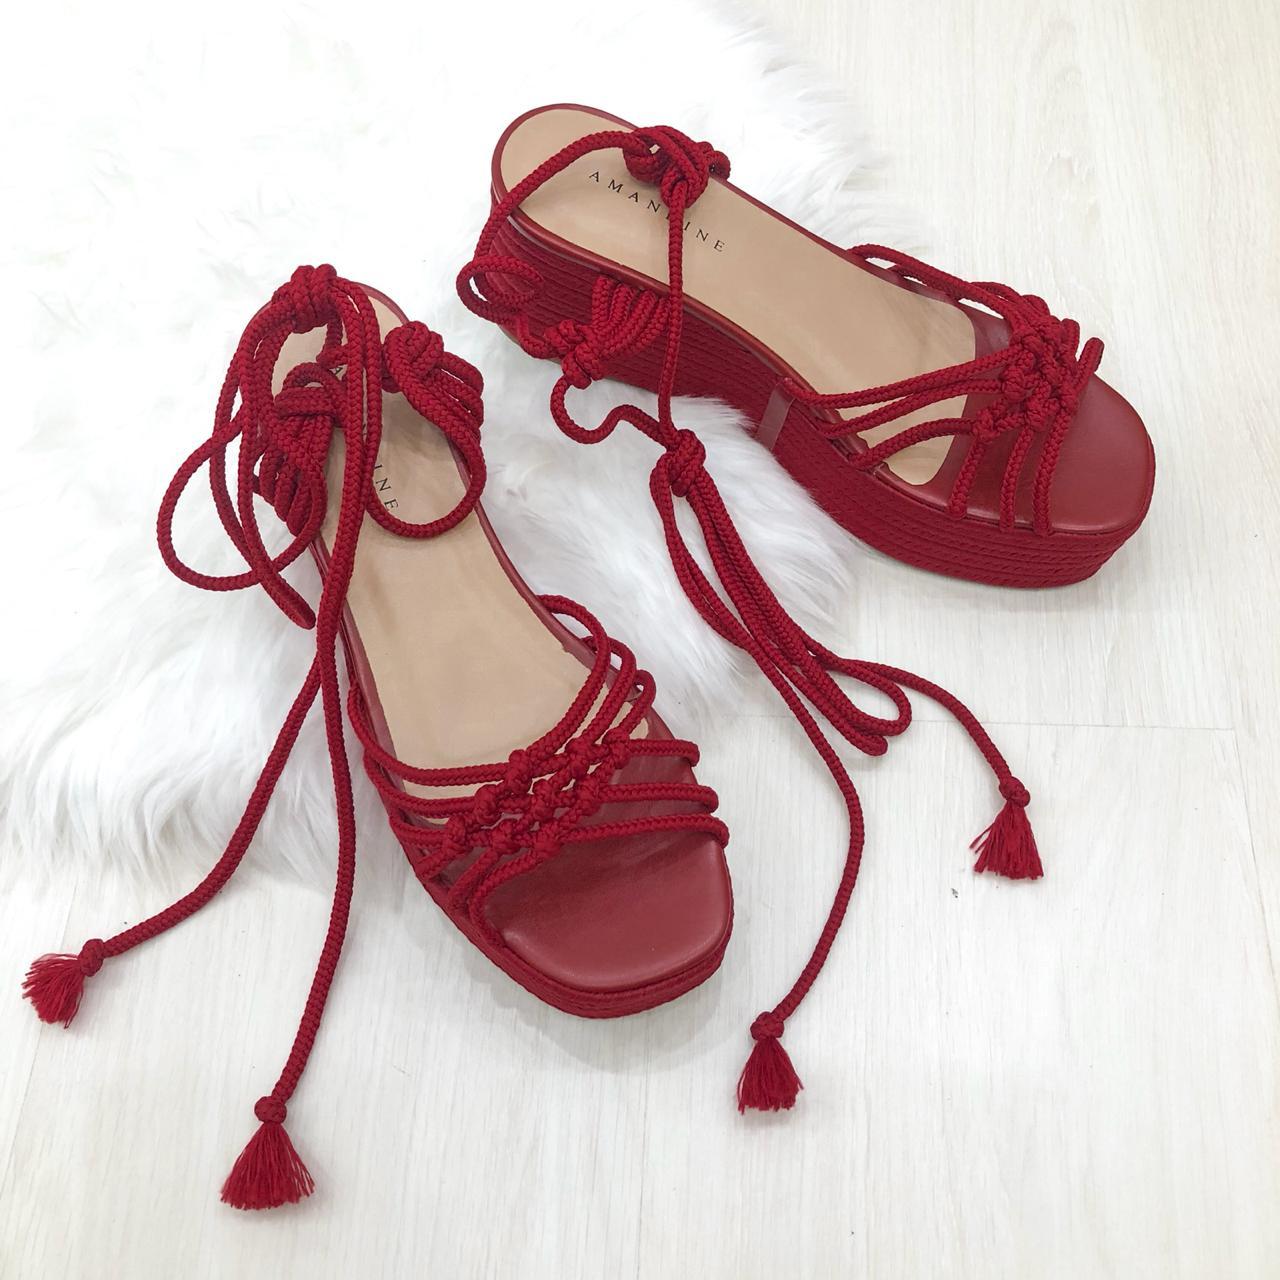 34ead9761d Tamanco Marbella VermelhoSandáliasAmandine Shoes